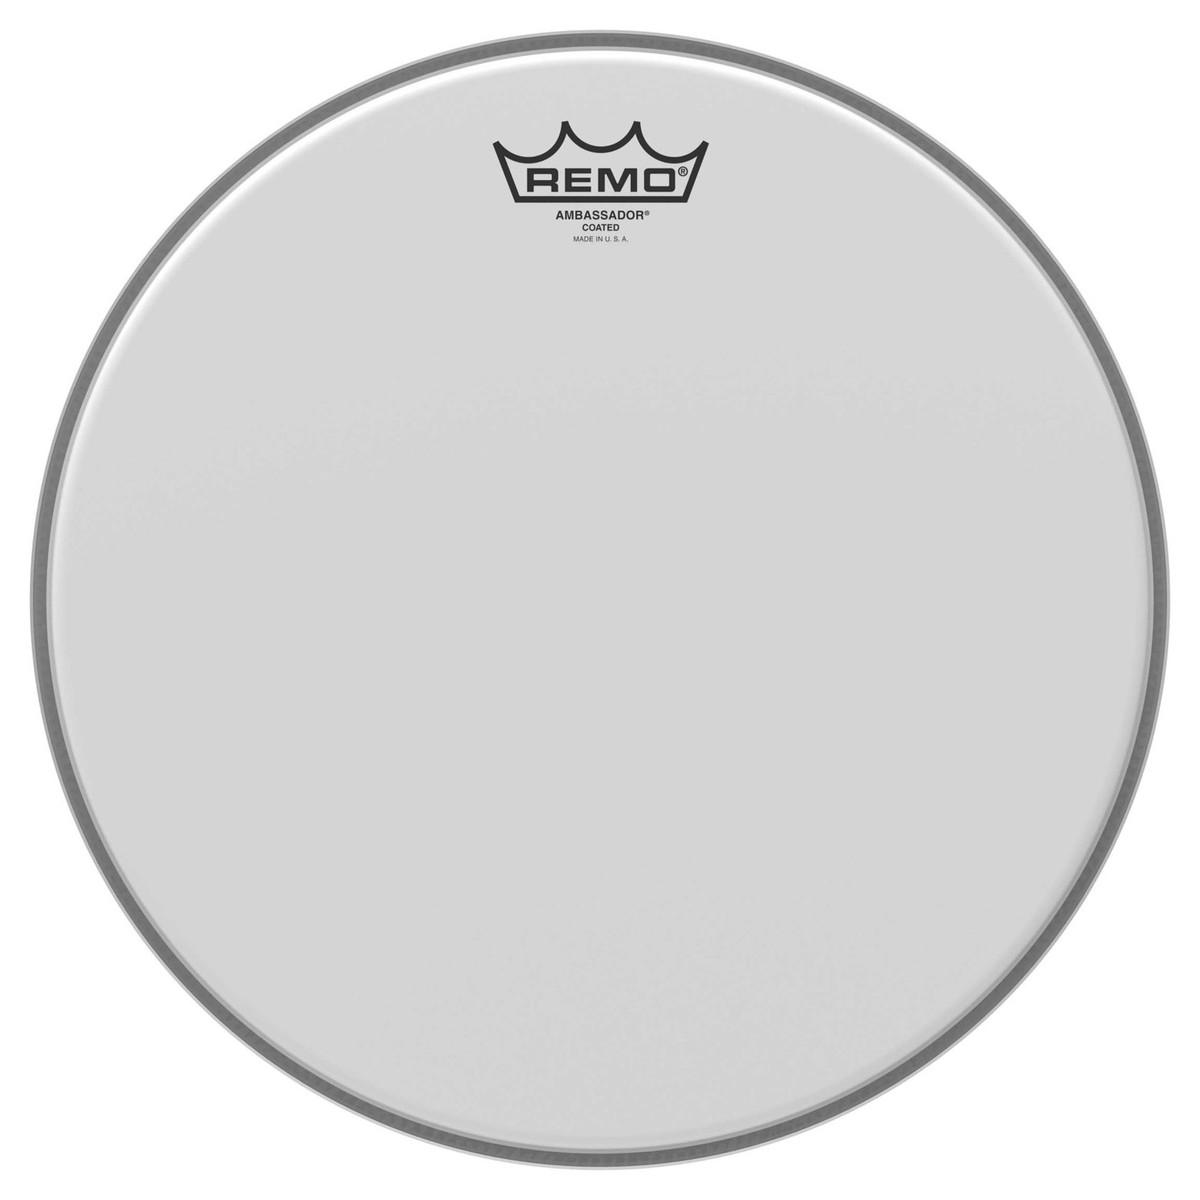 Remo Ambassador Coated 16 Drum Head